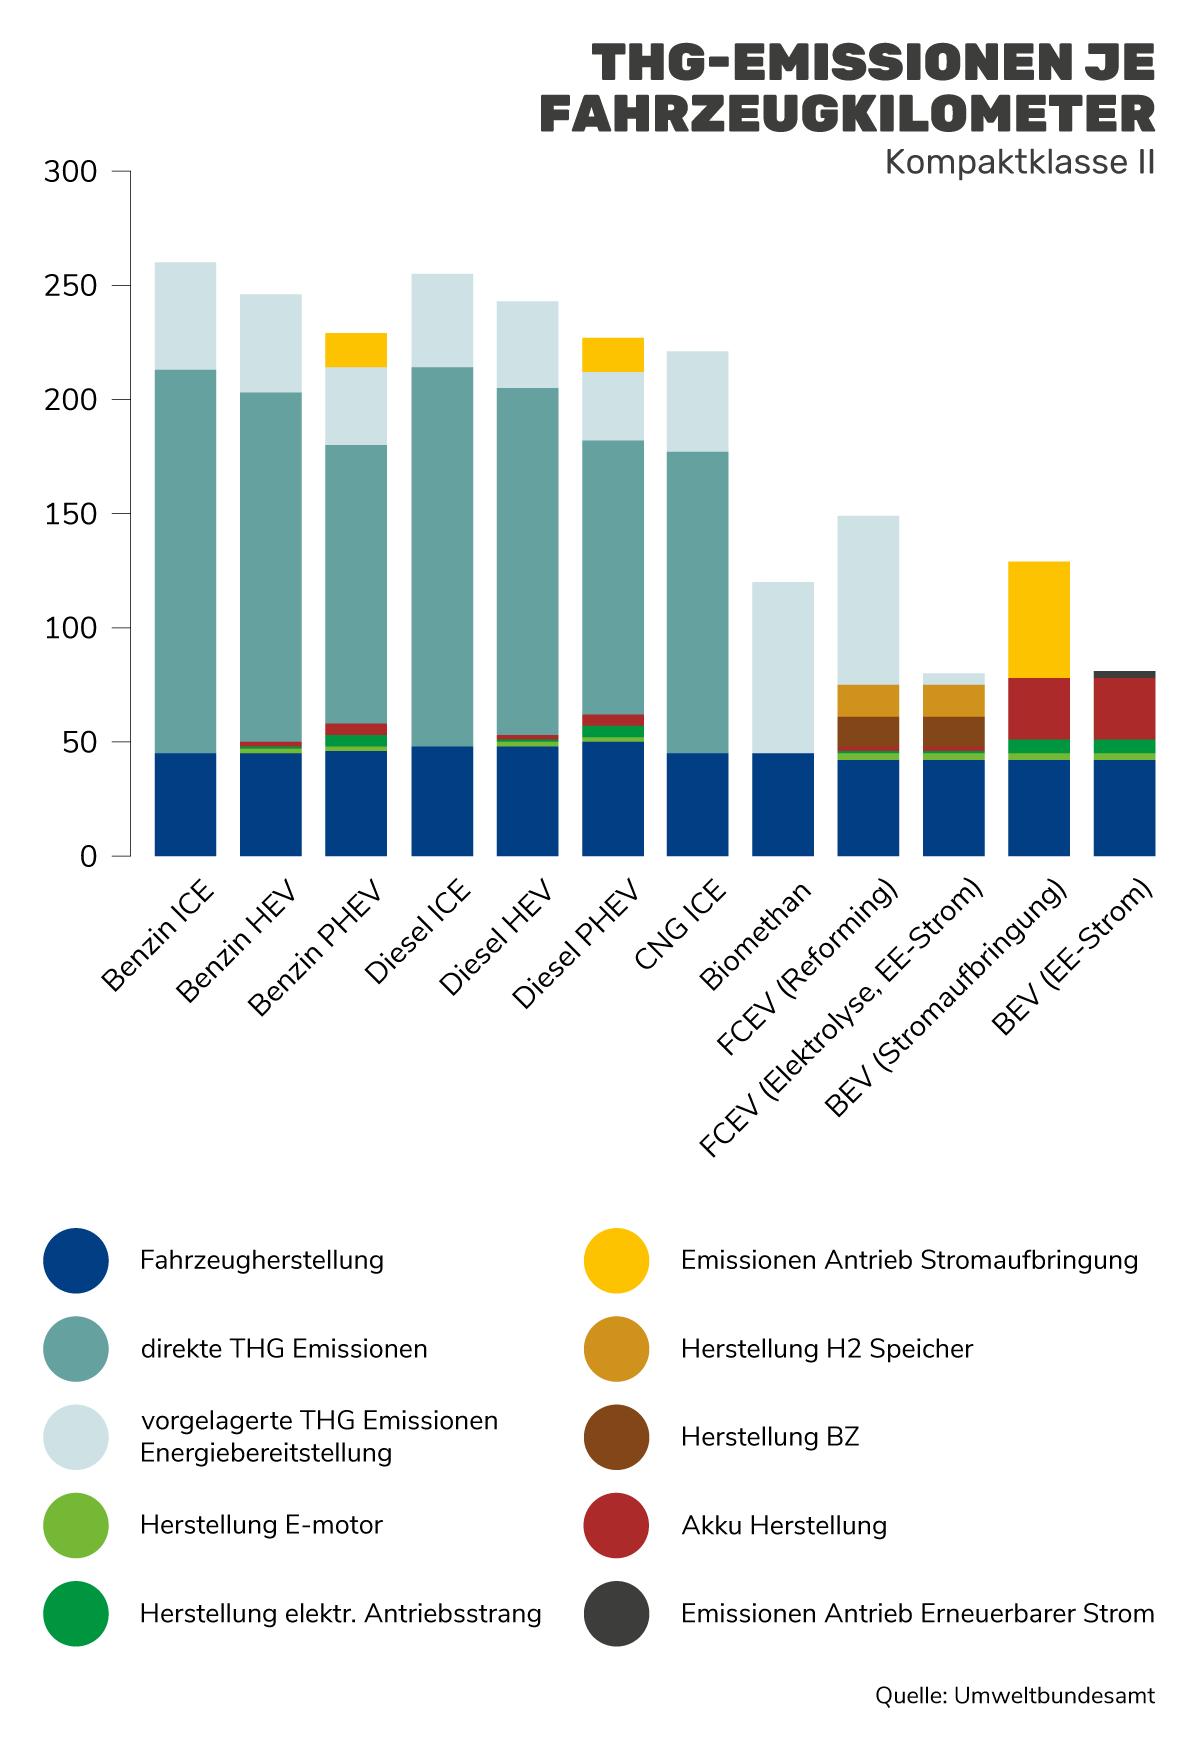 Grafik: THG-Emissionen je Fahrzeugkilometer Kompaktklasse II